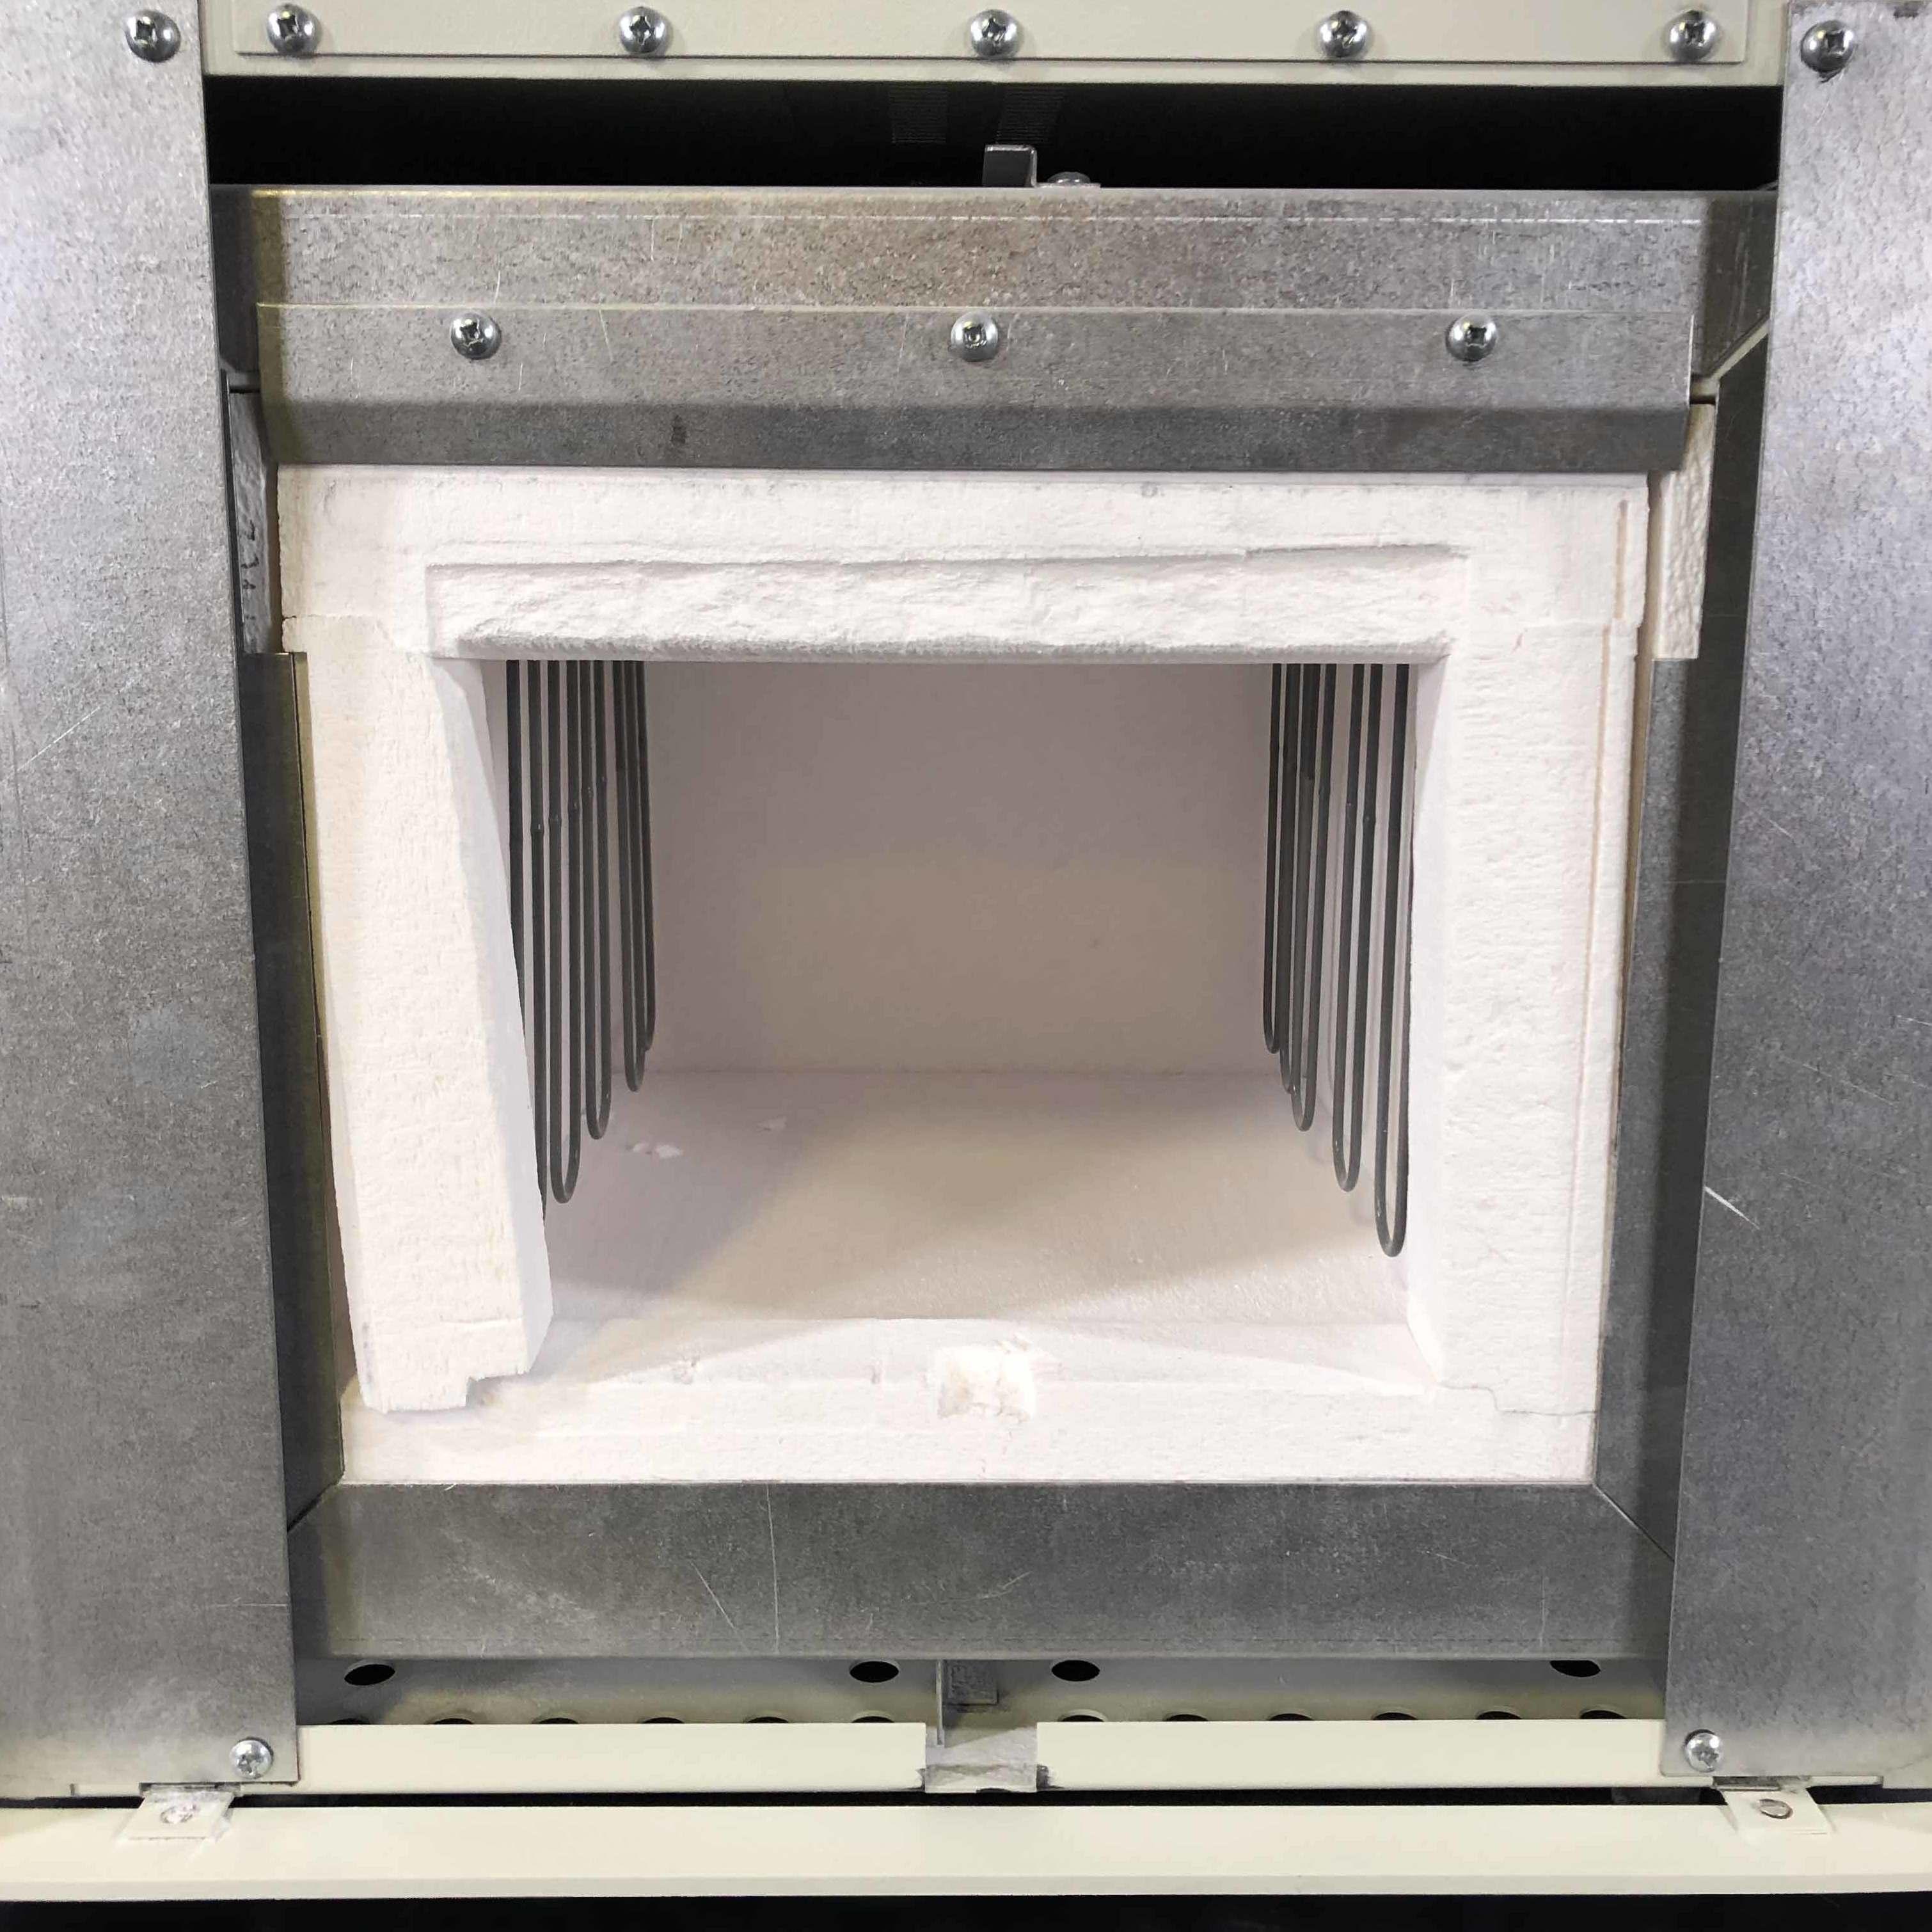 Lindberg/Blue M 1700°C Box Furnace Model BF51524C Name